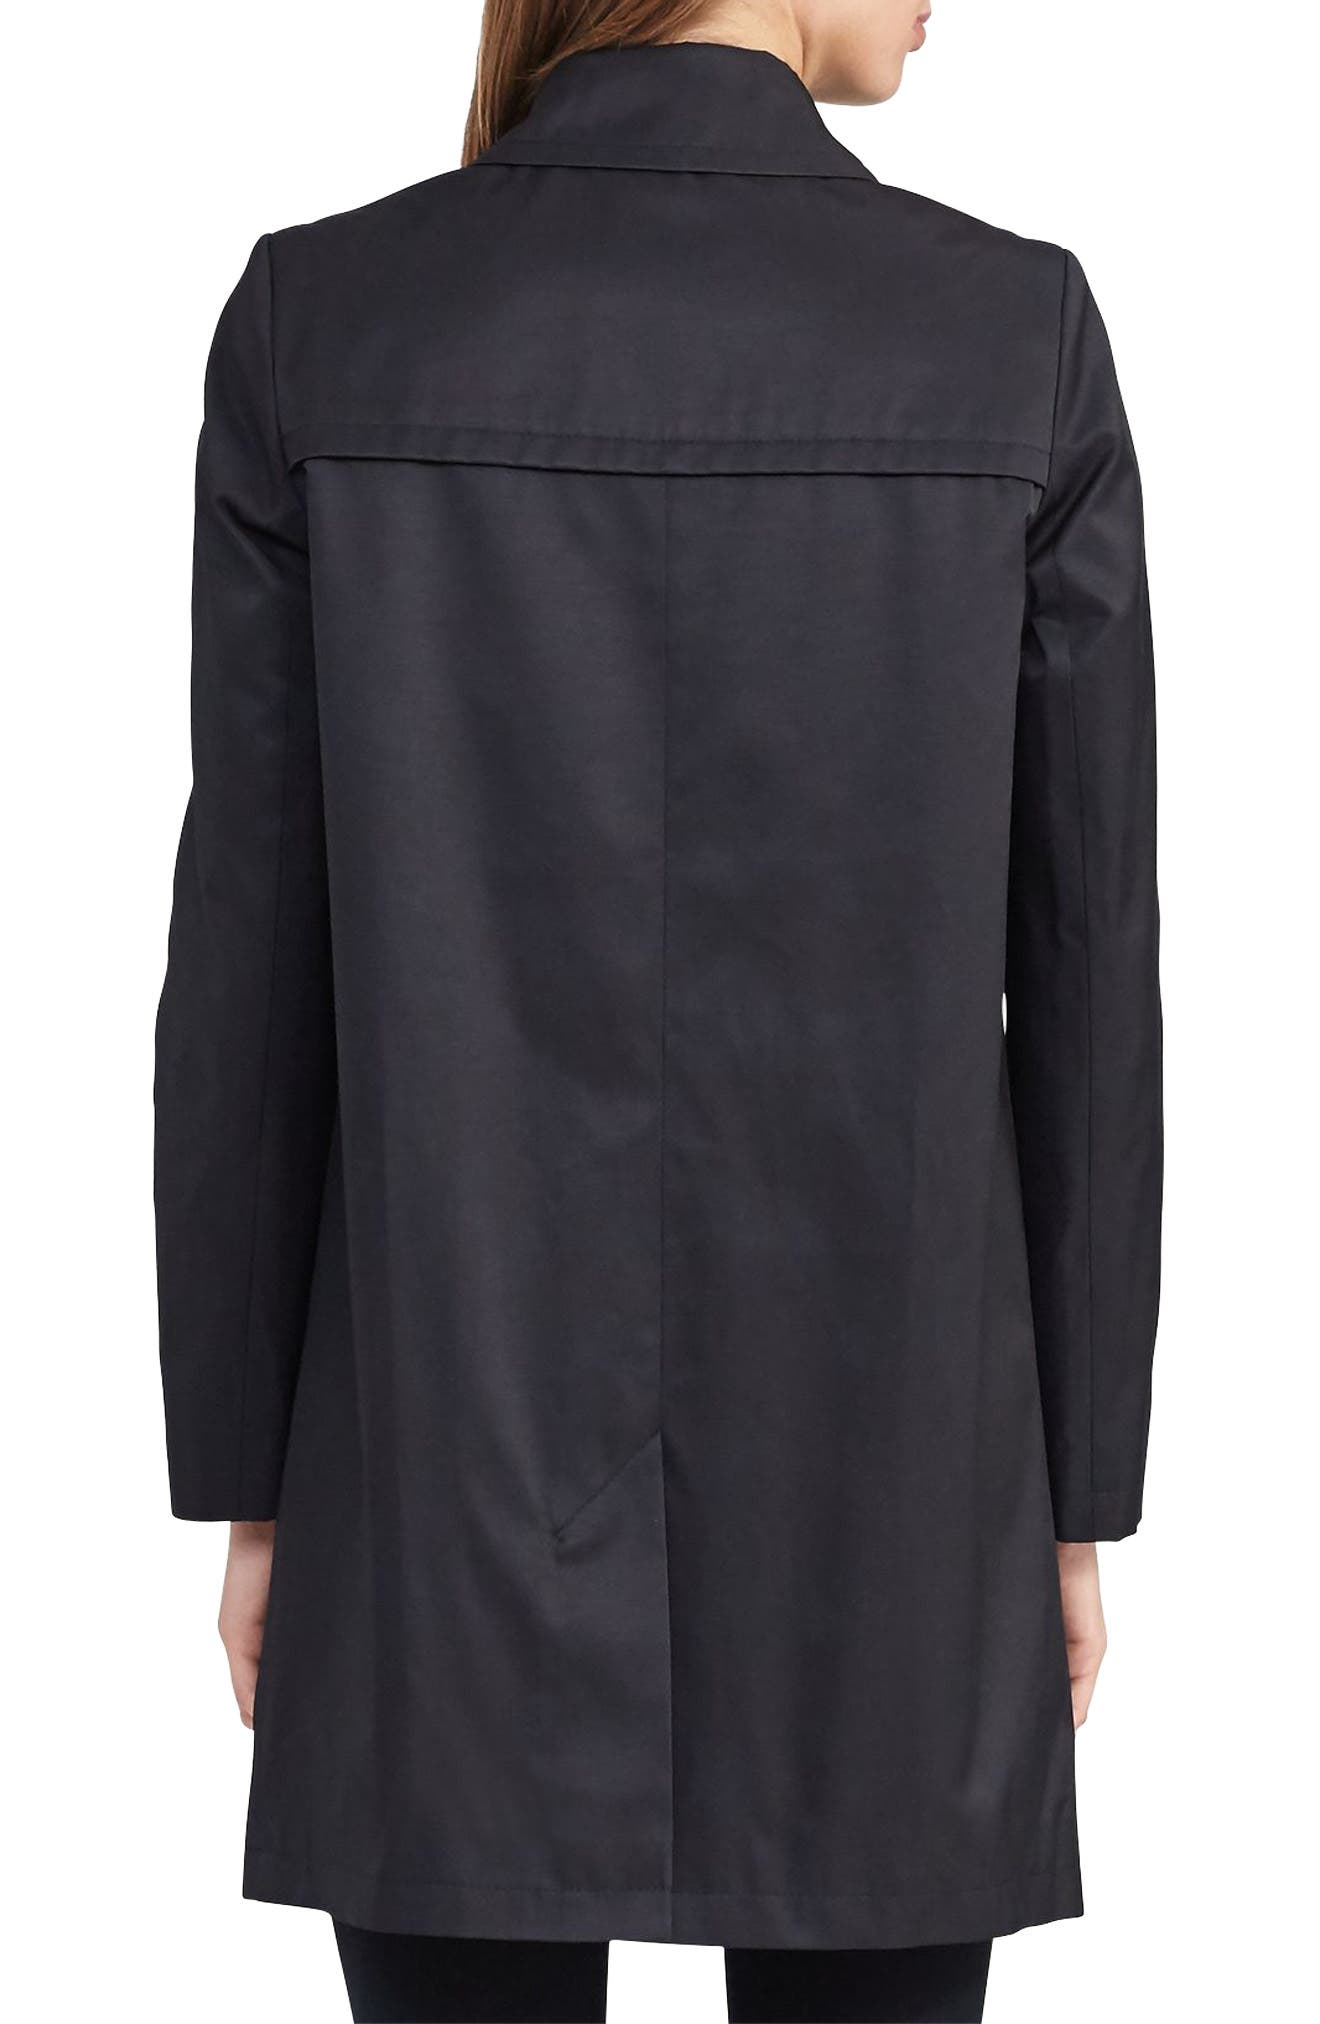 A-Line Trench Coat,                             Alternate thumbnail 3, color,                             Black